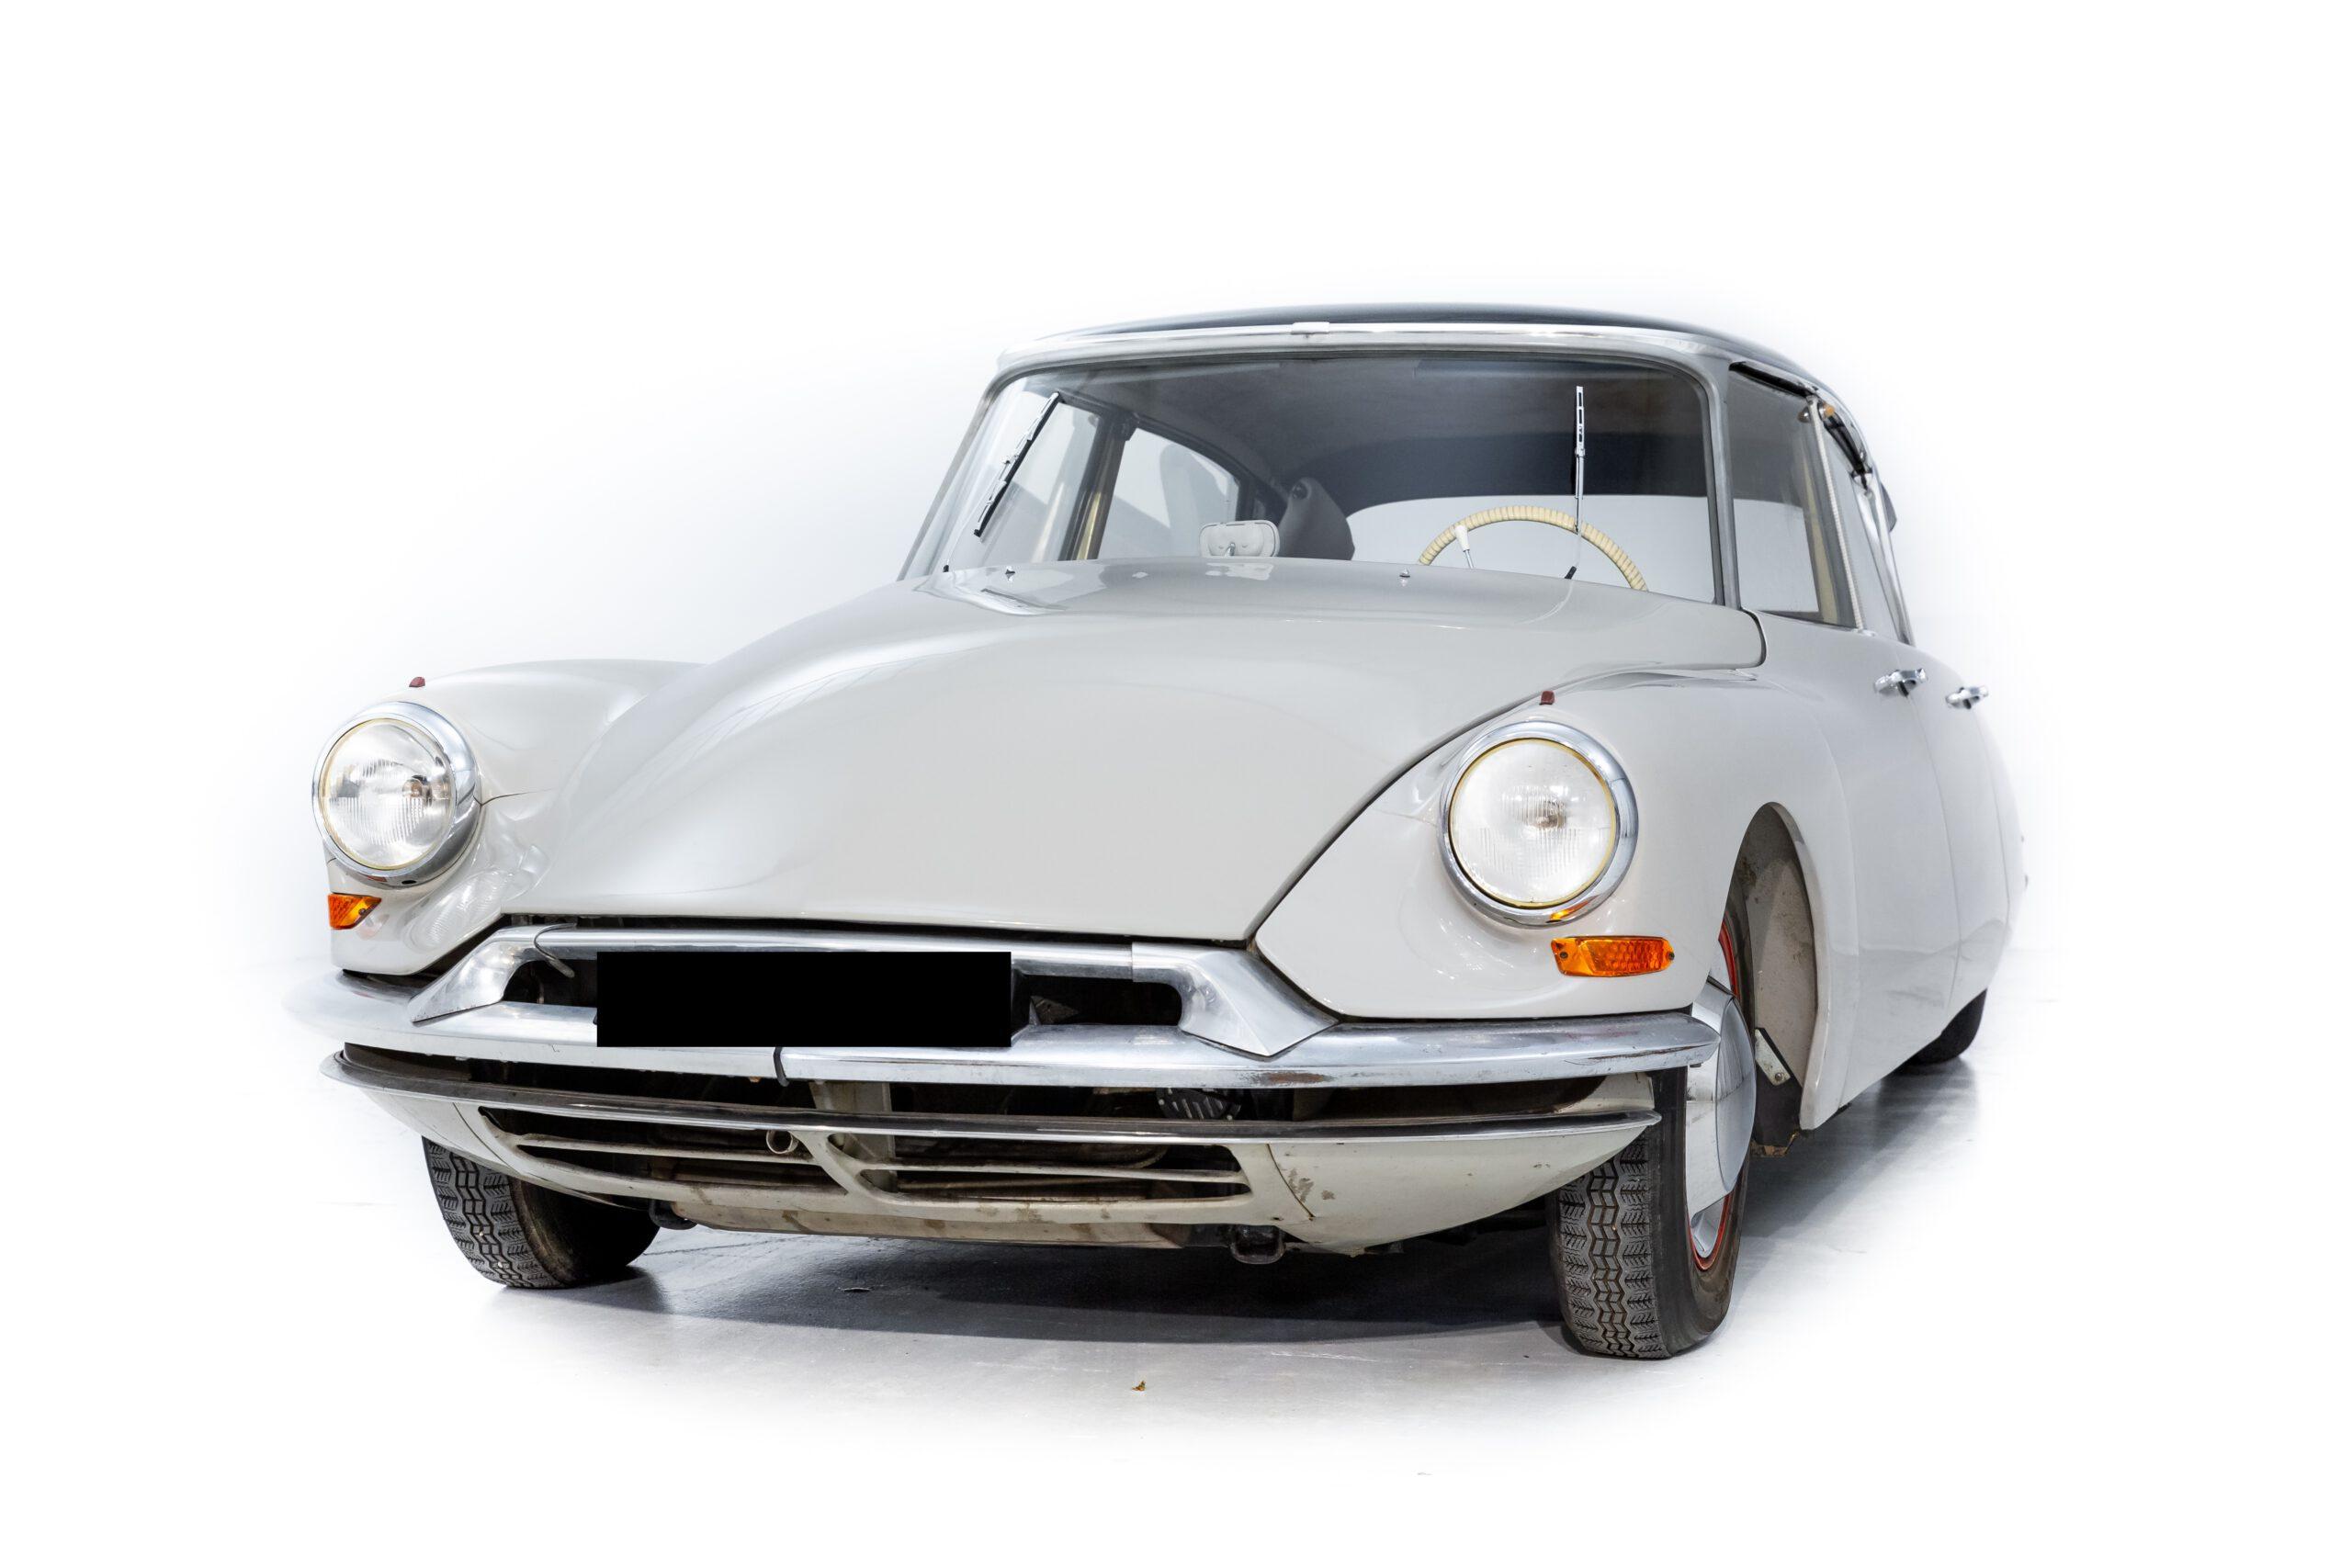 1957 Citroën DS19 Mille Miglia